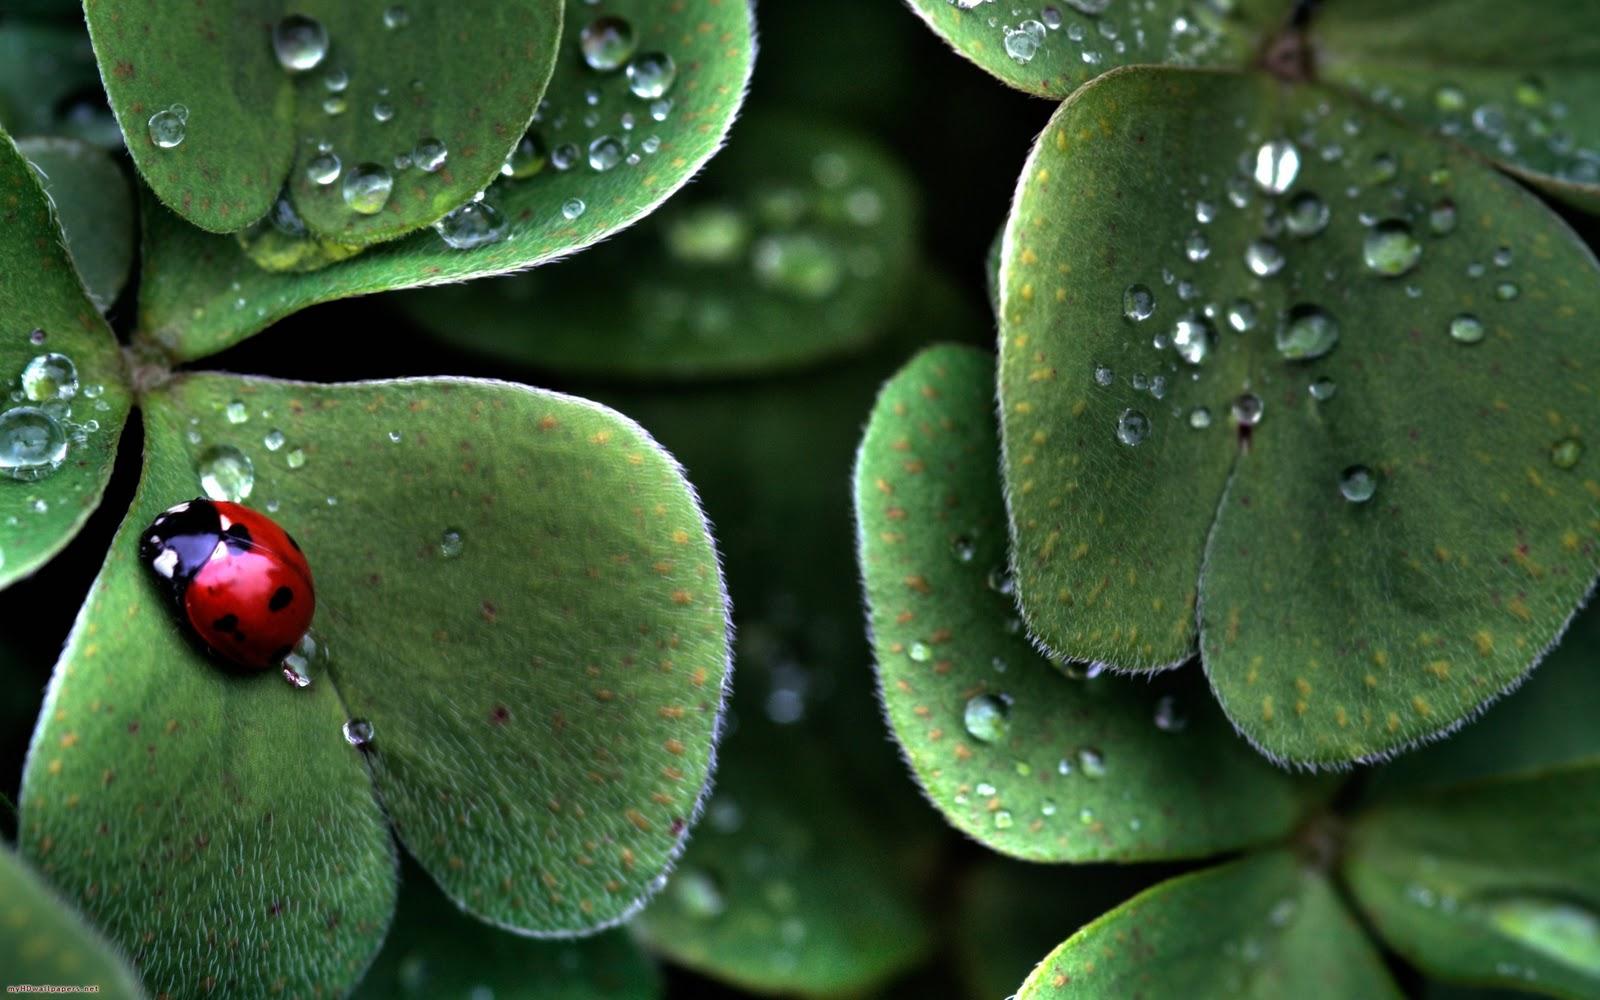 http://3.bp.blogspot.com/--Yx_hsfkirA/Tpxy8sJVS-I/AAAAAAAARbo/9ZGKDKinjIM/s1600/Ladybug-and-lucky-clovers-2560x1600.jpg